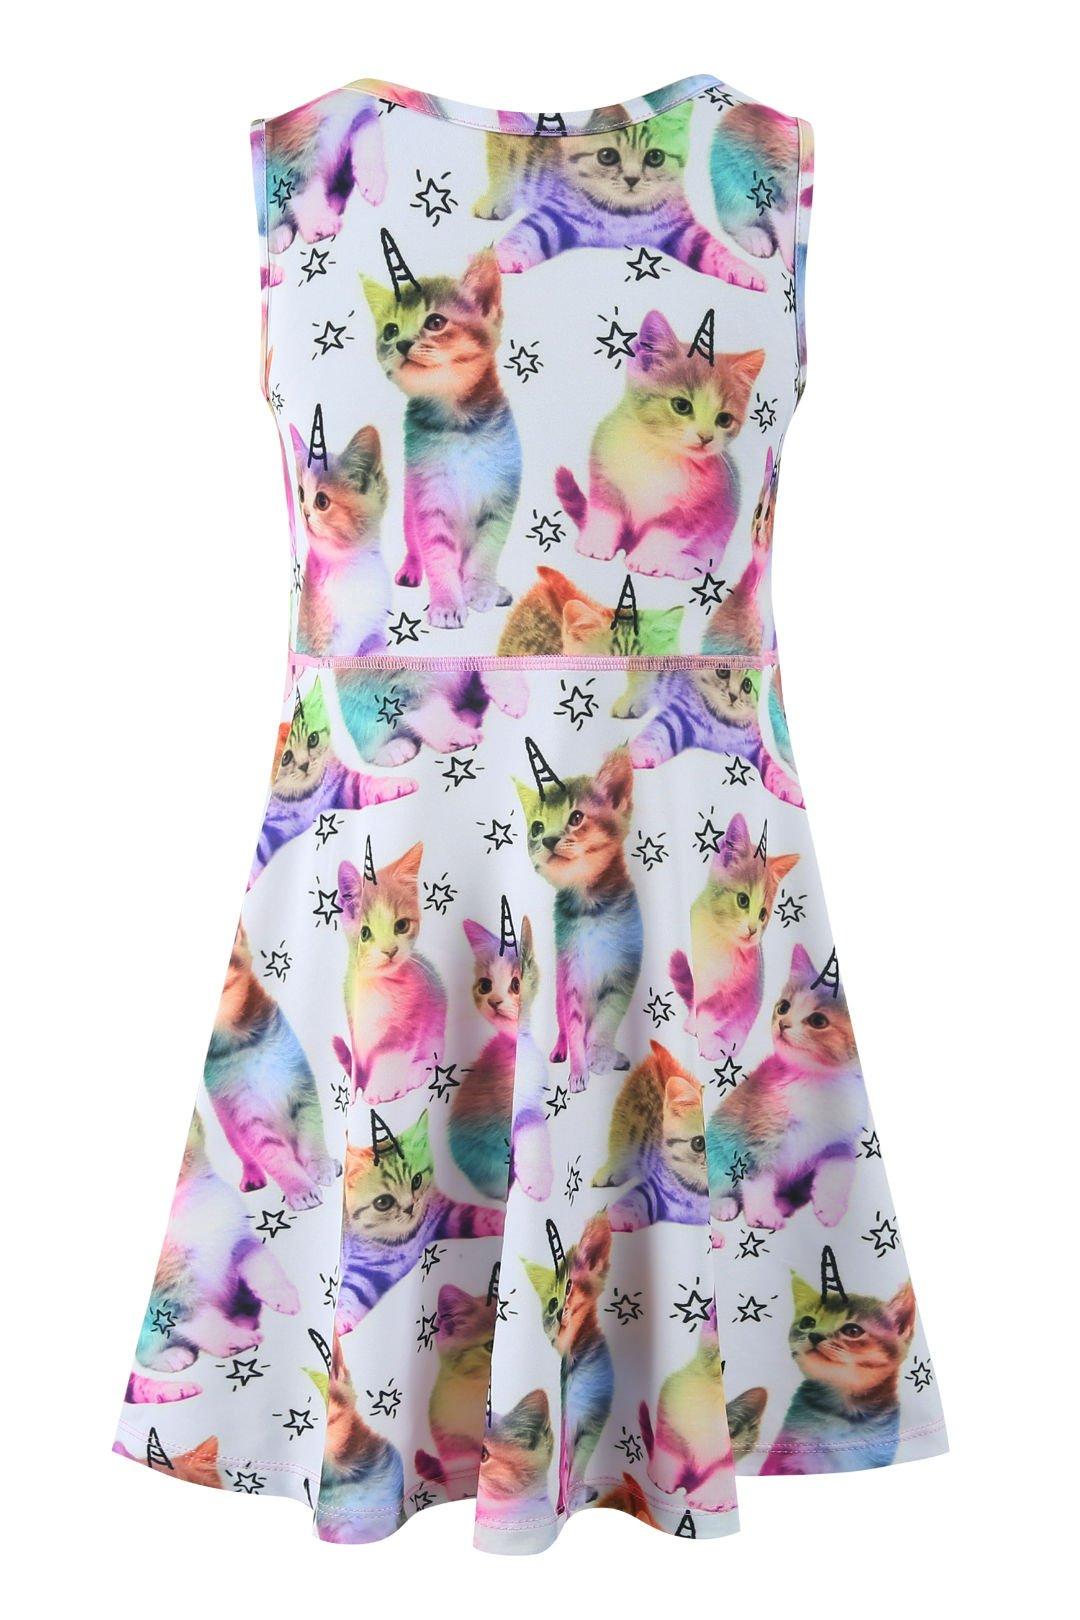 Liliane Tutu Dress for Girls Summer Dresses for Girls Dress 4t 5t Dresses for Girls(A009,4-5Y) by Liliane (Image #5)